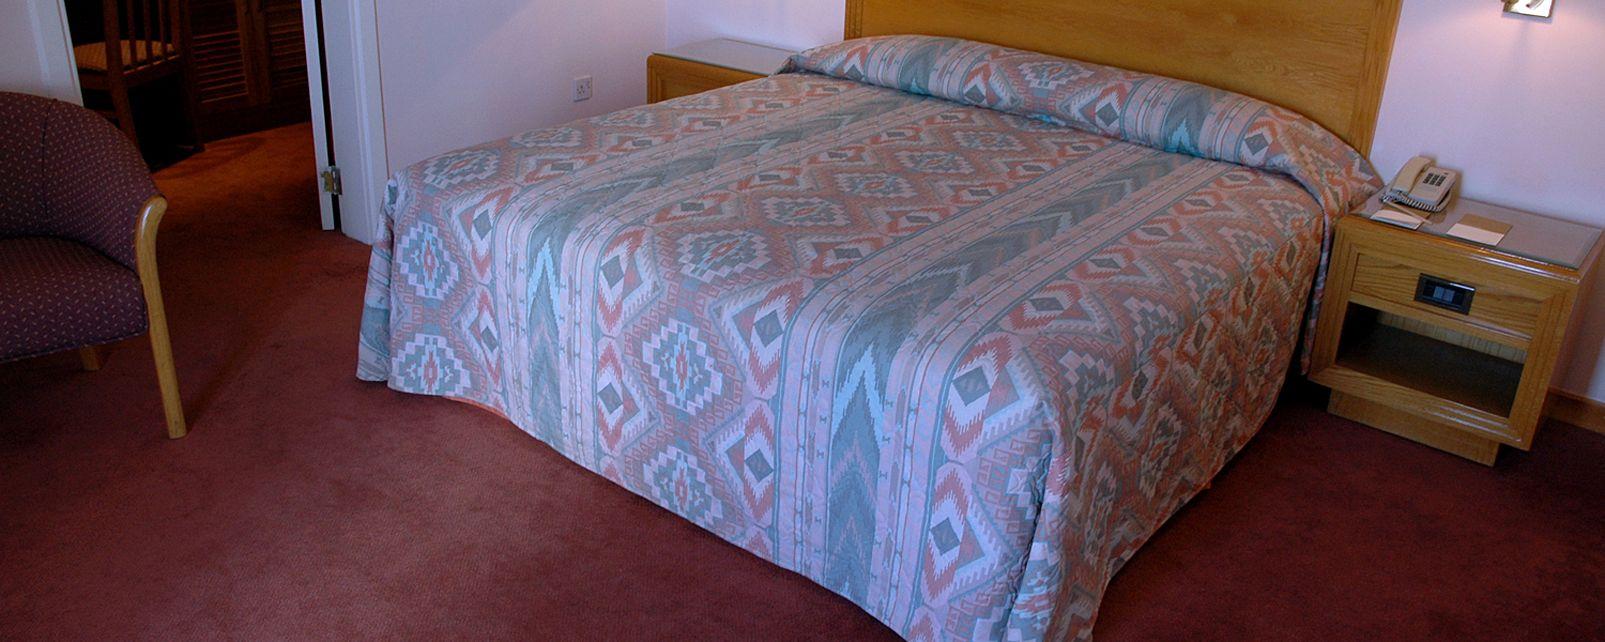 Hotel Moevenpick Nabatean Castle Hotel